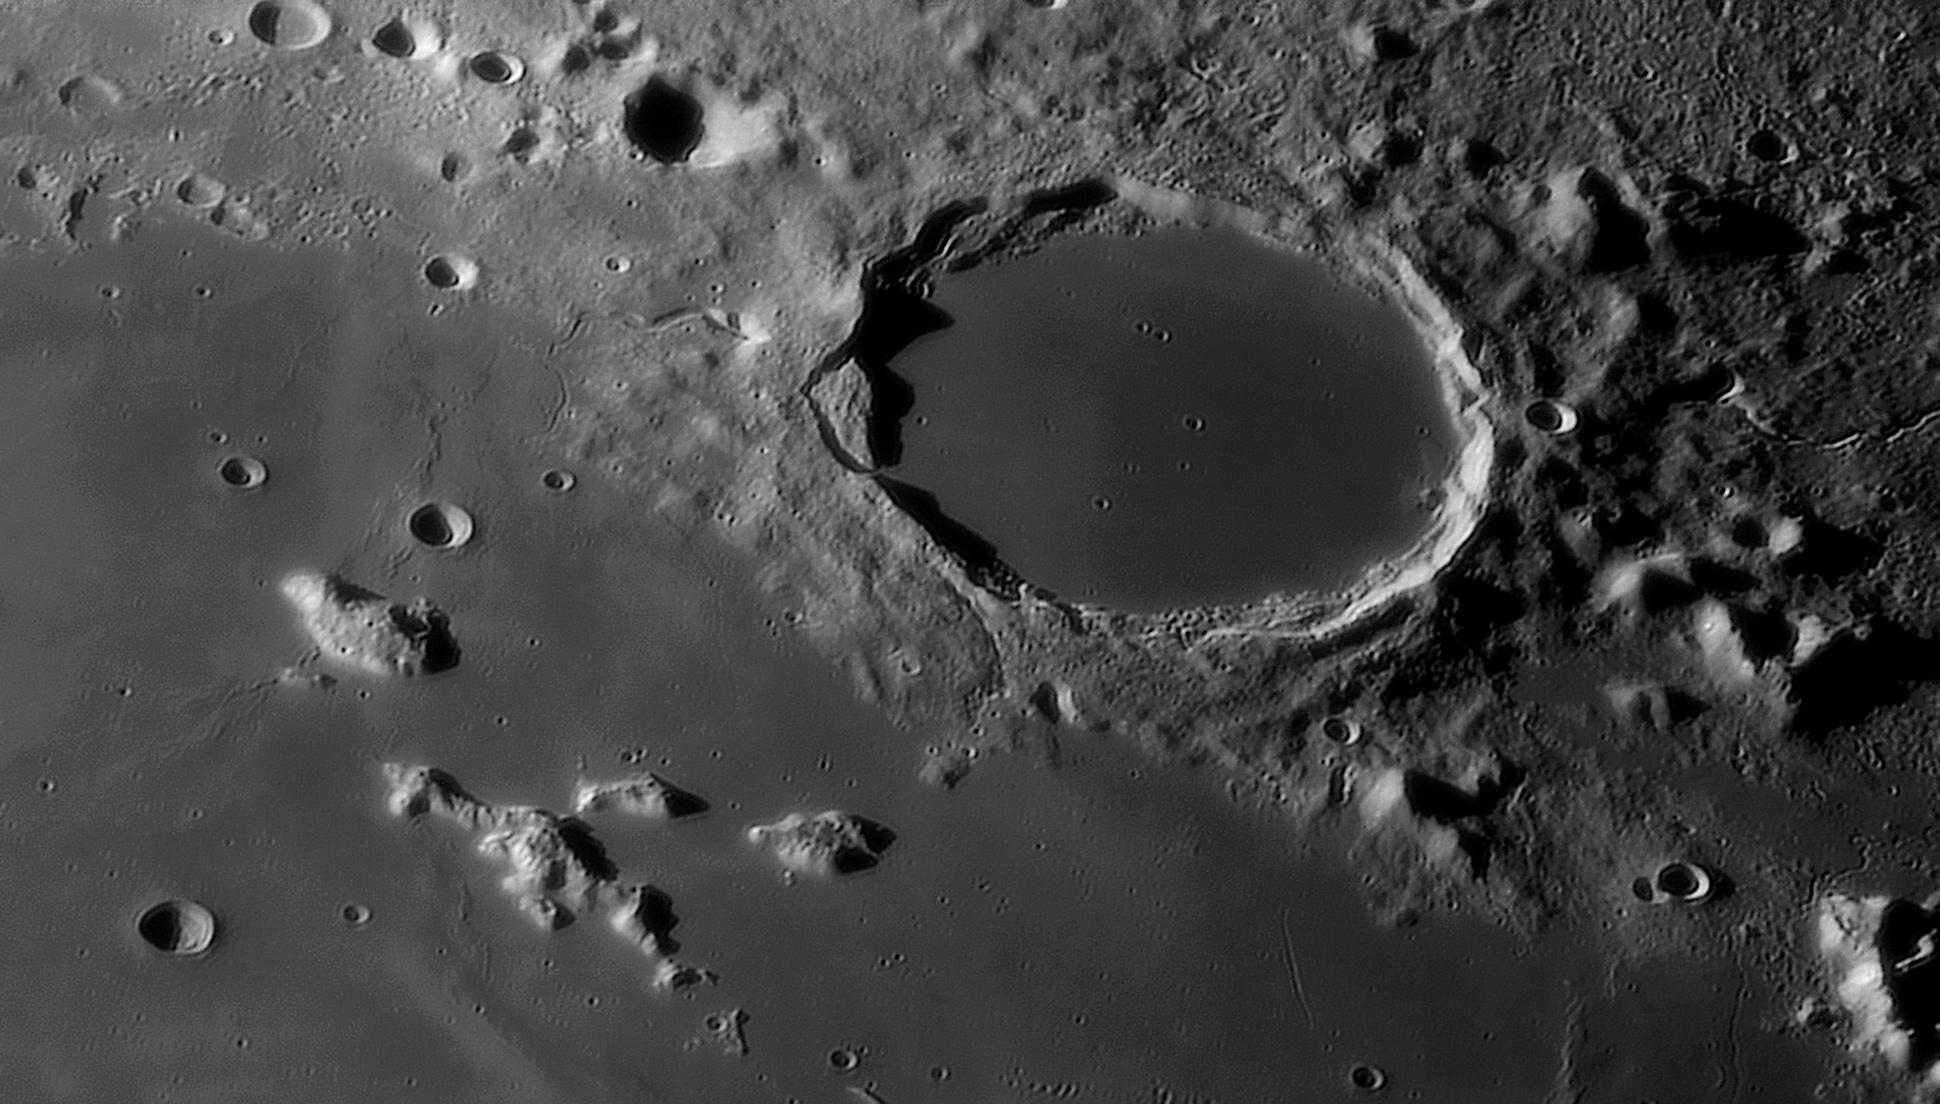 moon_21_09_2019_03_32_53_r_610_PLATON_FINALE1.jpg.b943ef642754937fd99bfc900c337ac1.jpg